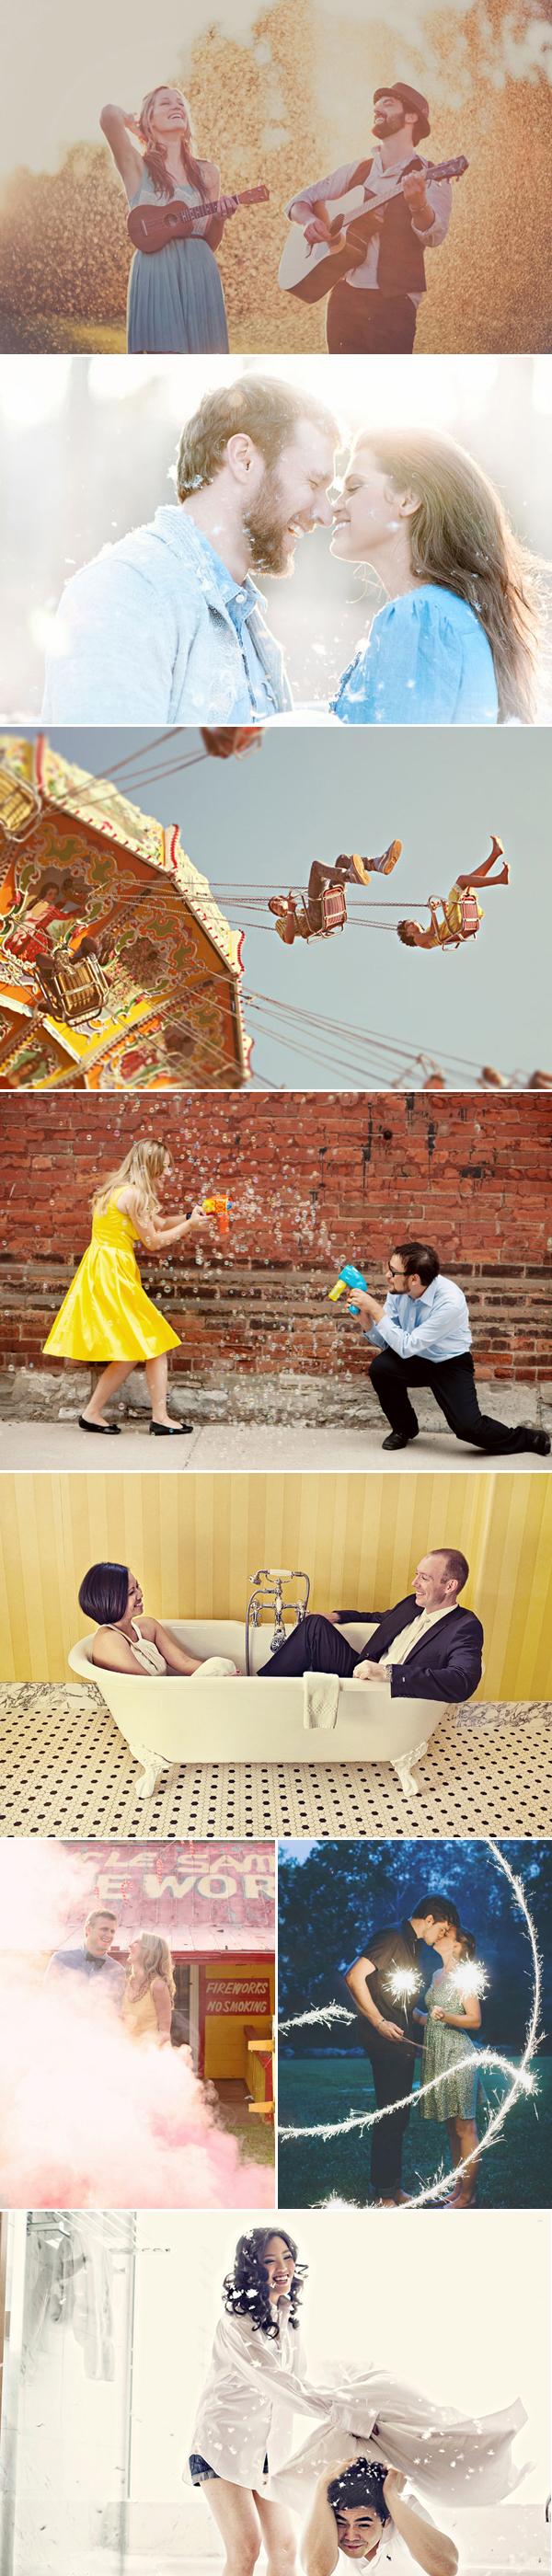 fun engagement01-playful